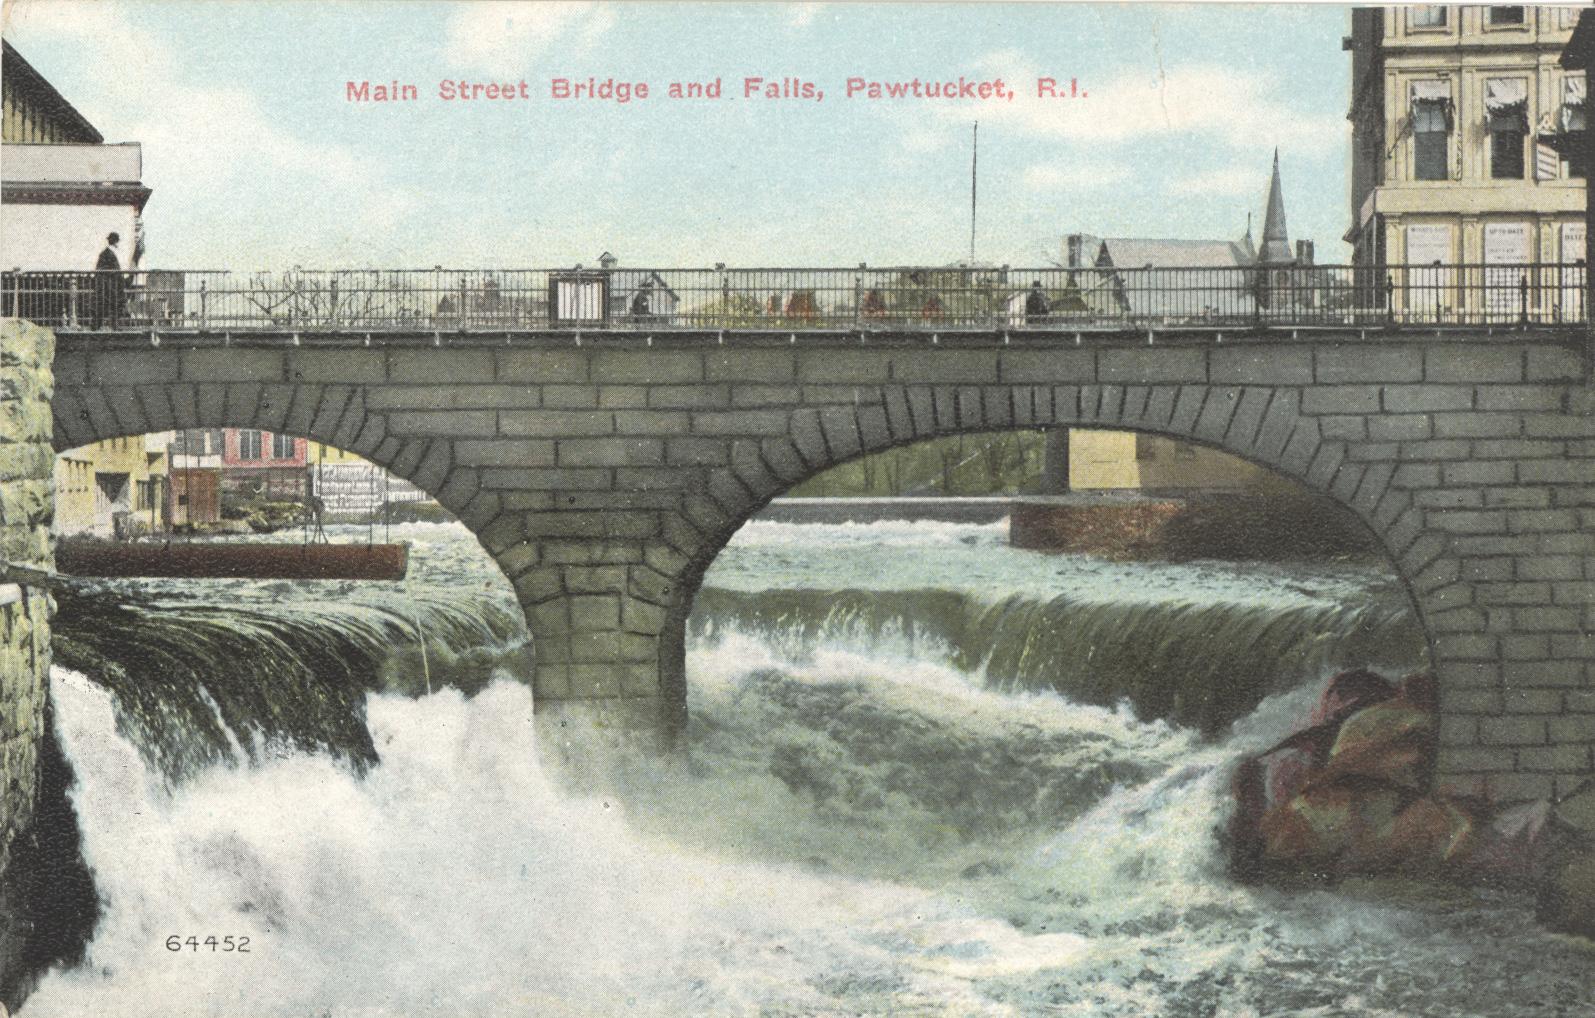 Pawtucket Falls & Main Street Bridge (Postcard)